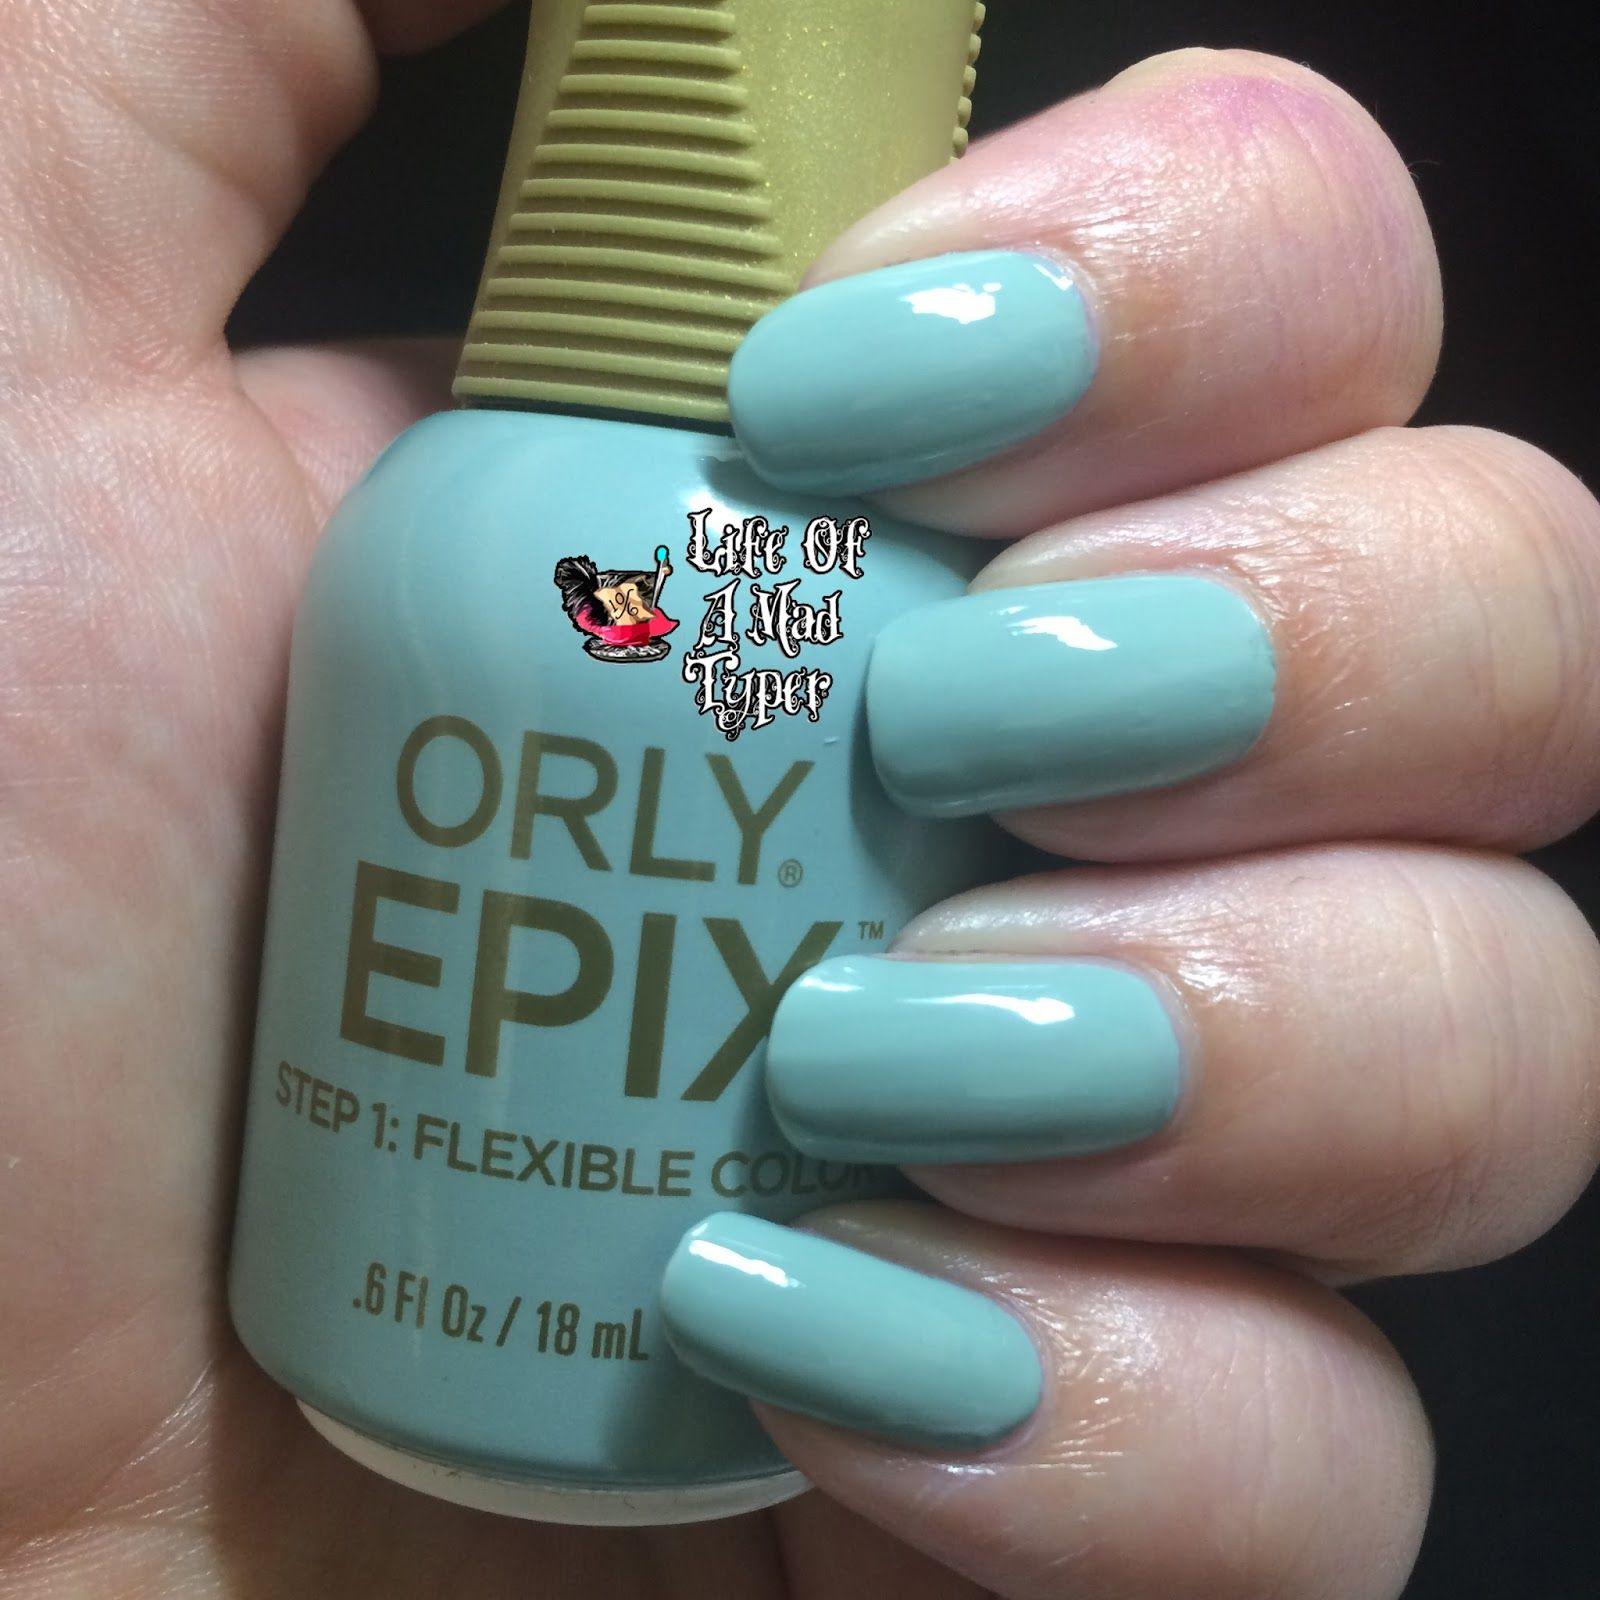 Orly Epix Flexible Color Nail Polish in Cameo | Nail polish | Pinterest